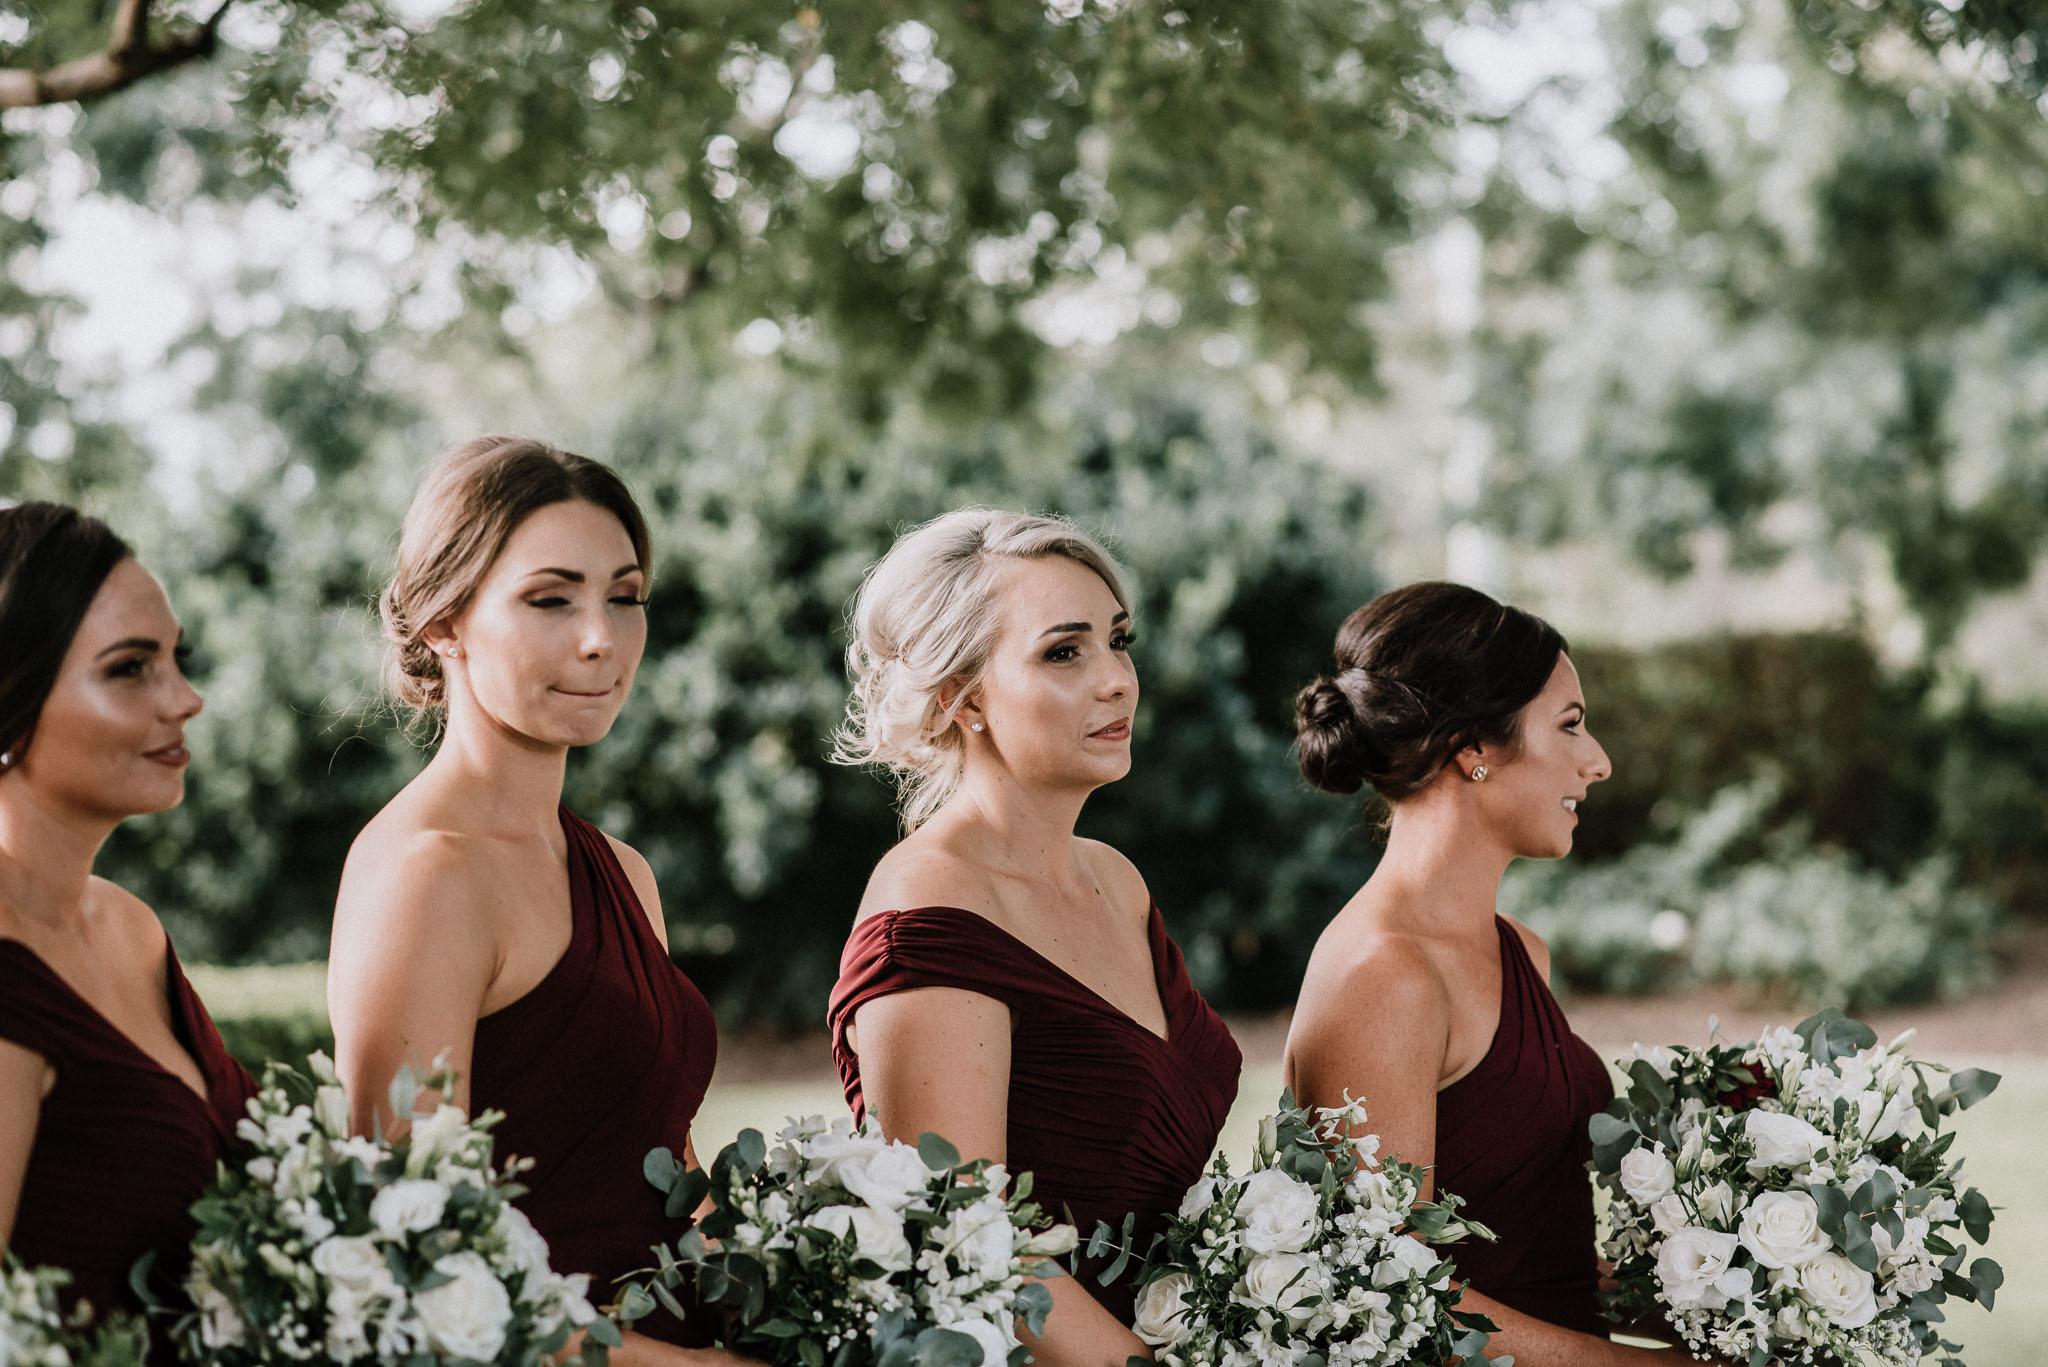 MECURE-RESORT-WEDDING-KING-WEB-47.jpg